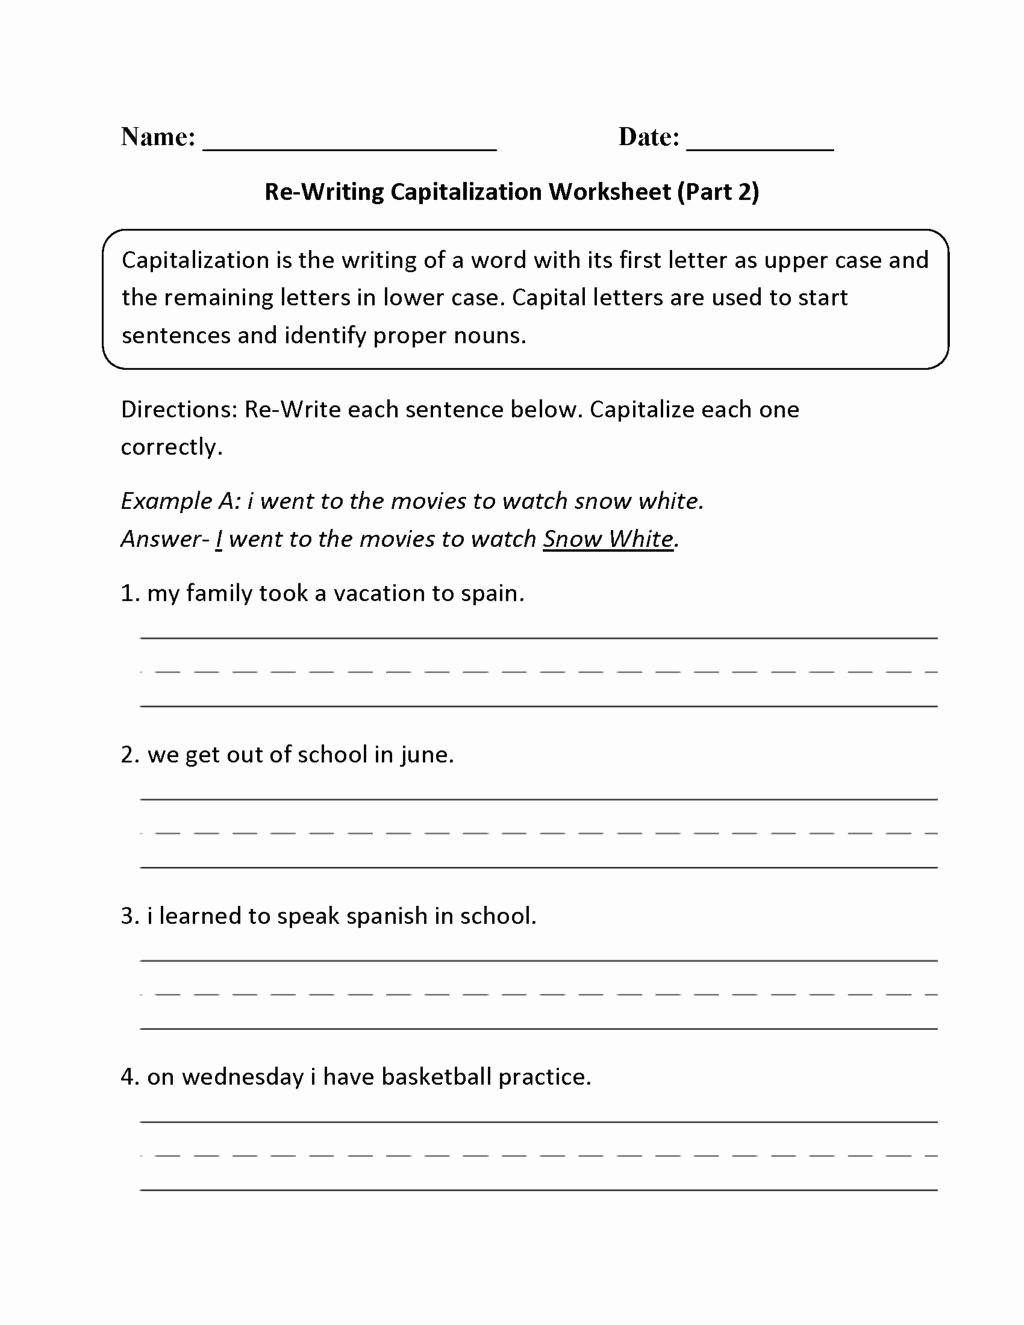 Paragraph Editing Worksheet Lovely 12 Paragraph Editing Worksheets 4th Grade